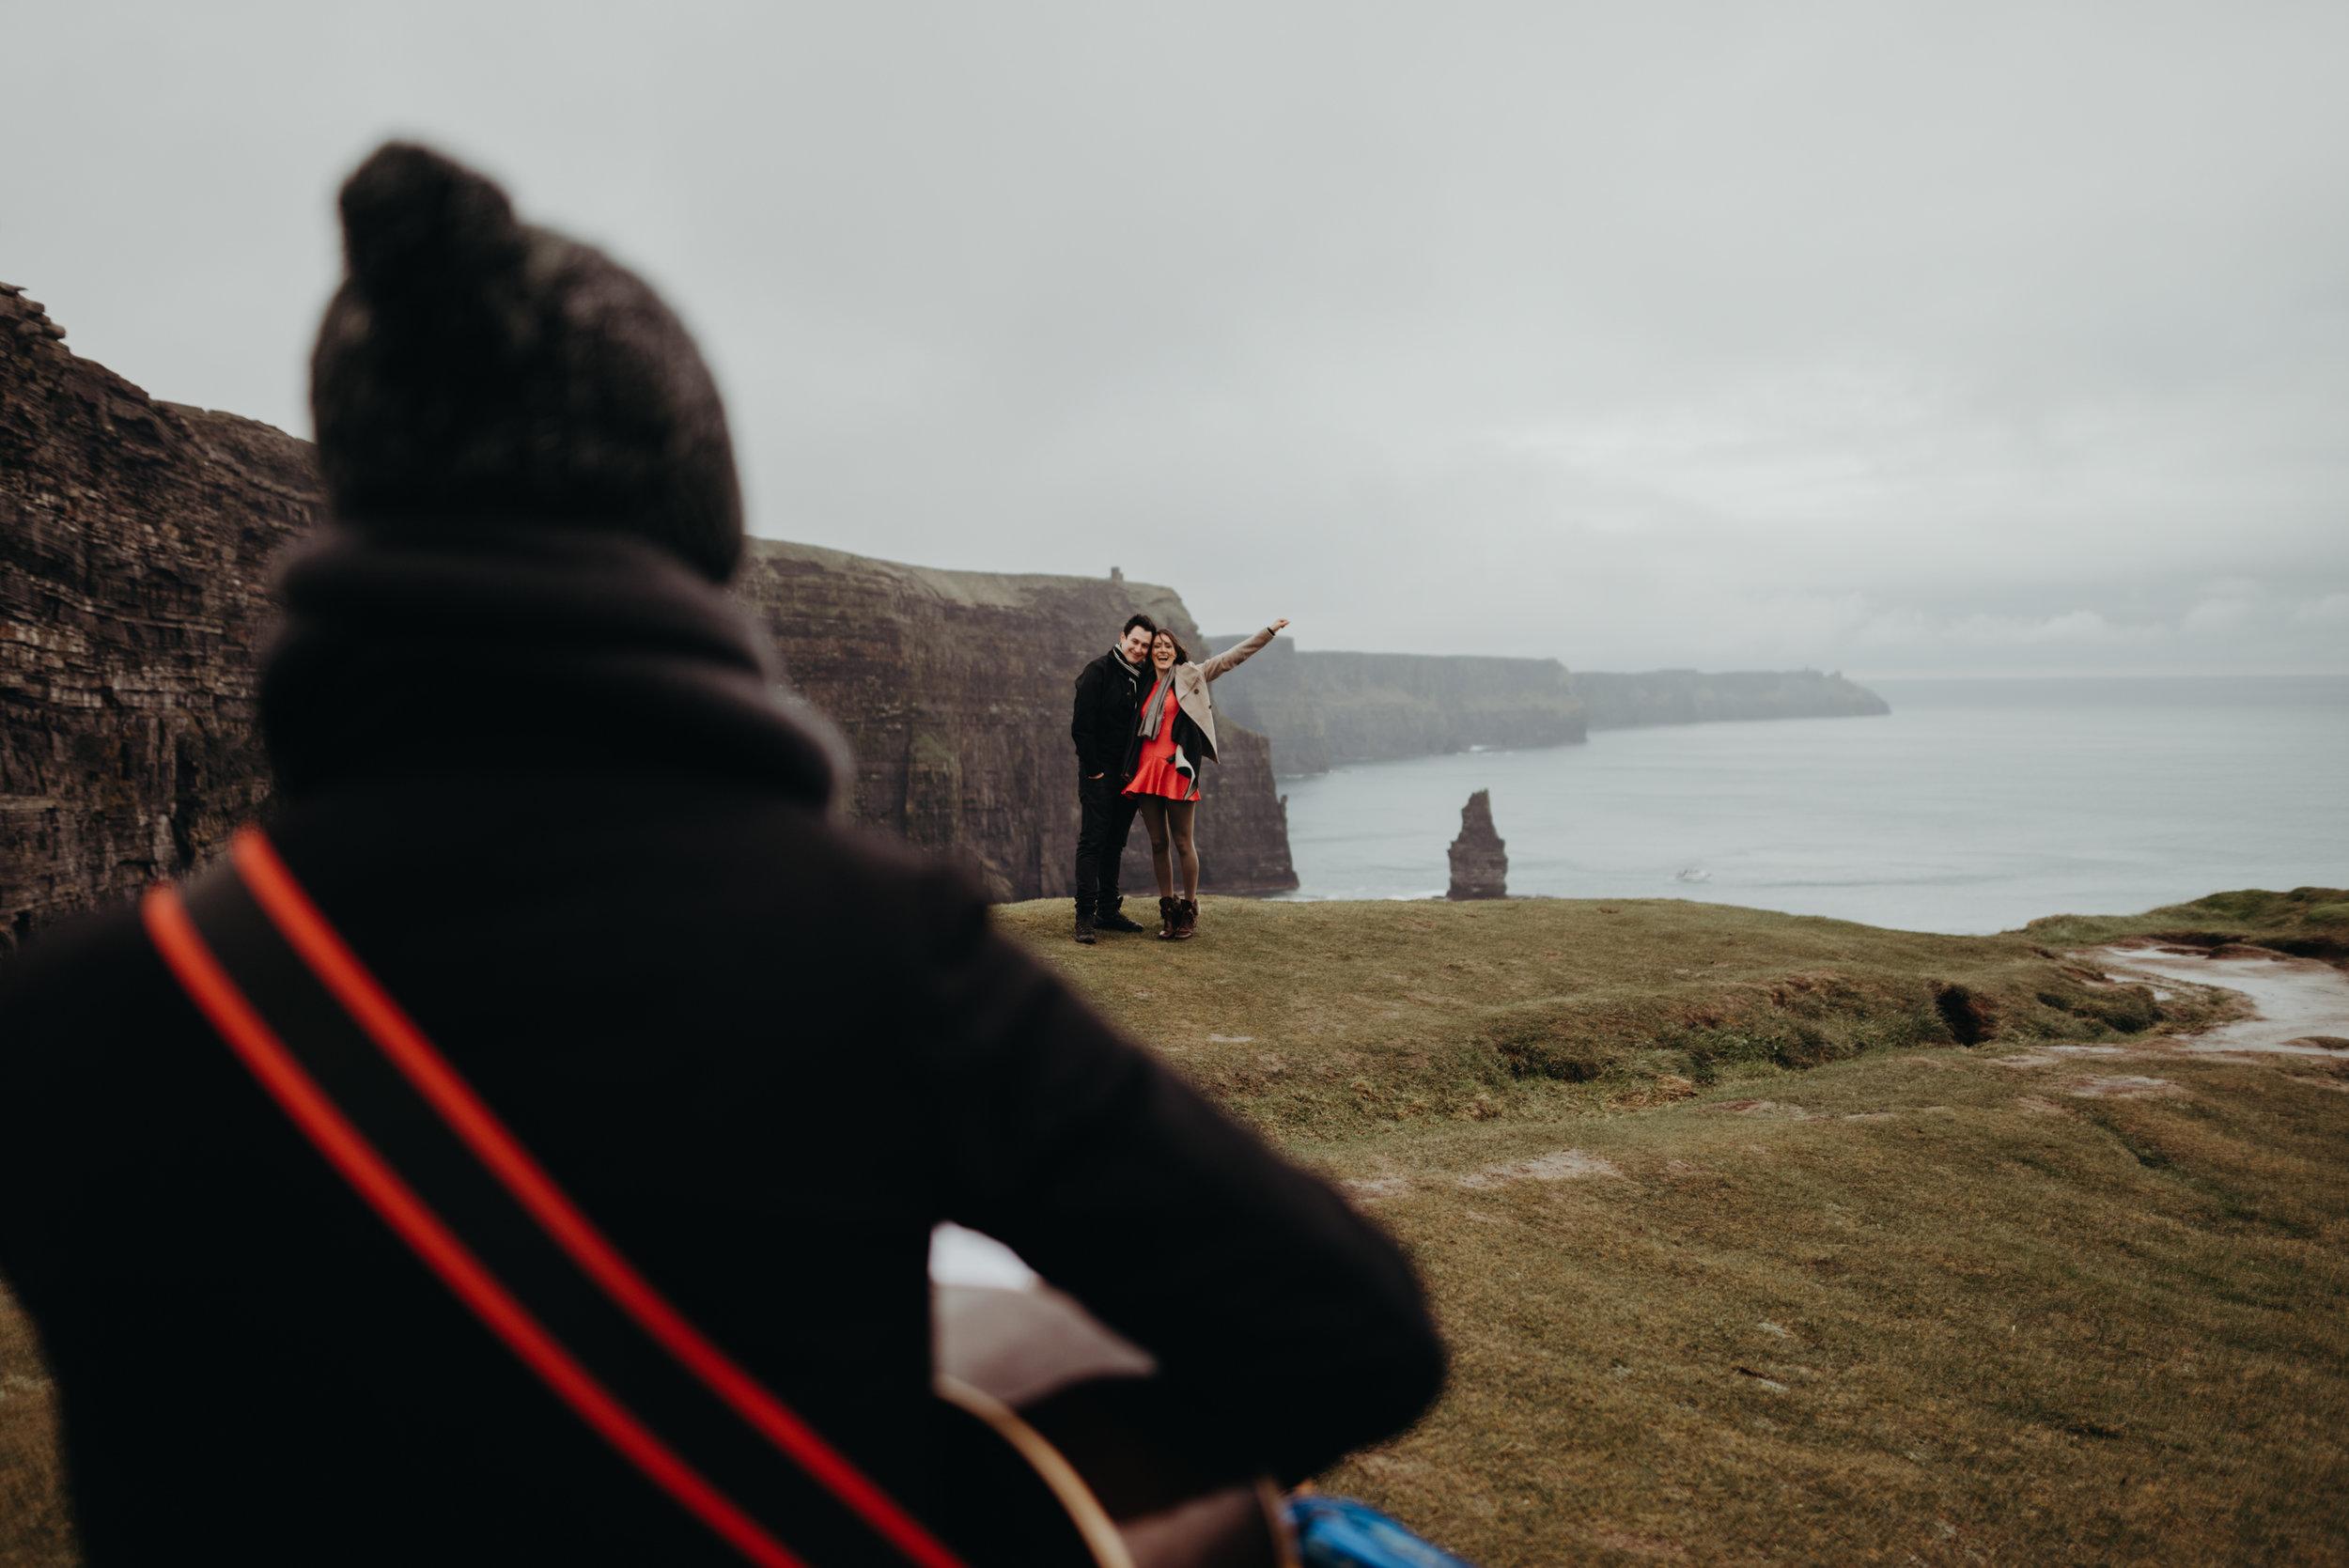 Cliffs Of Moher Engagement Session - Cliffs of Moher Proposal - Cliffs of Mhoer Elopement_5197-Edit-6.jpg